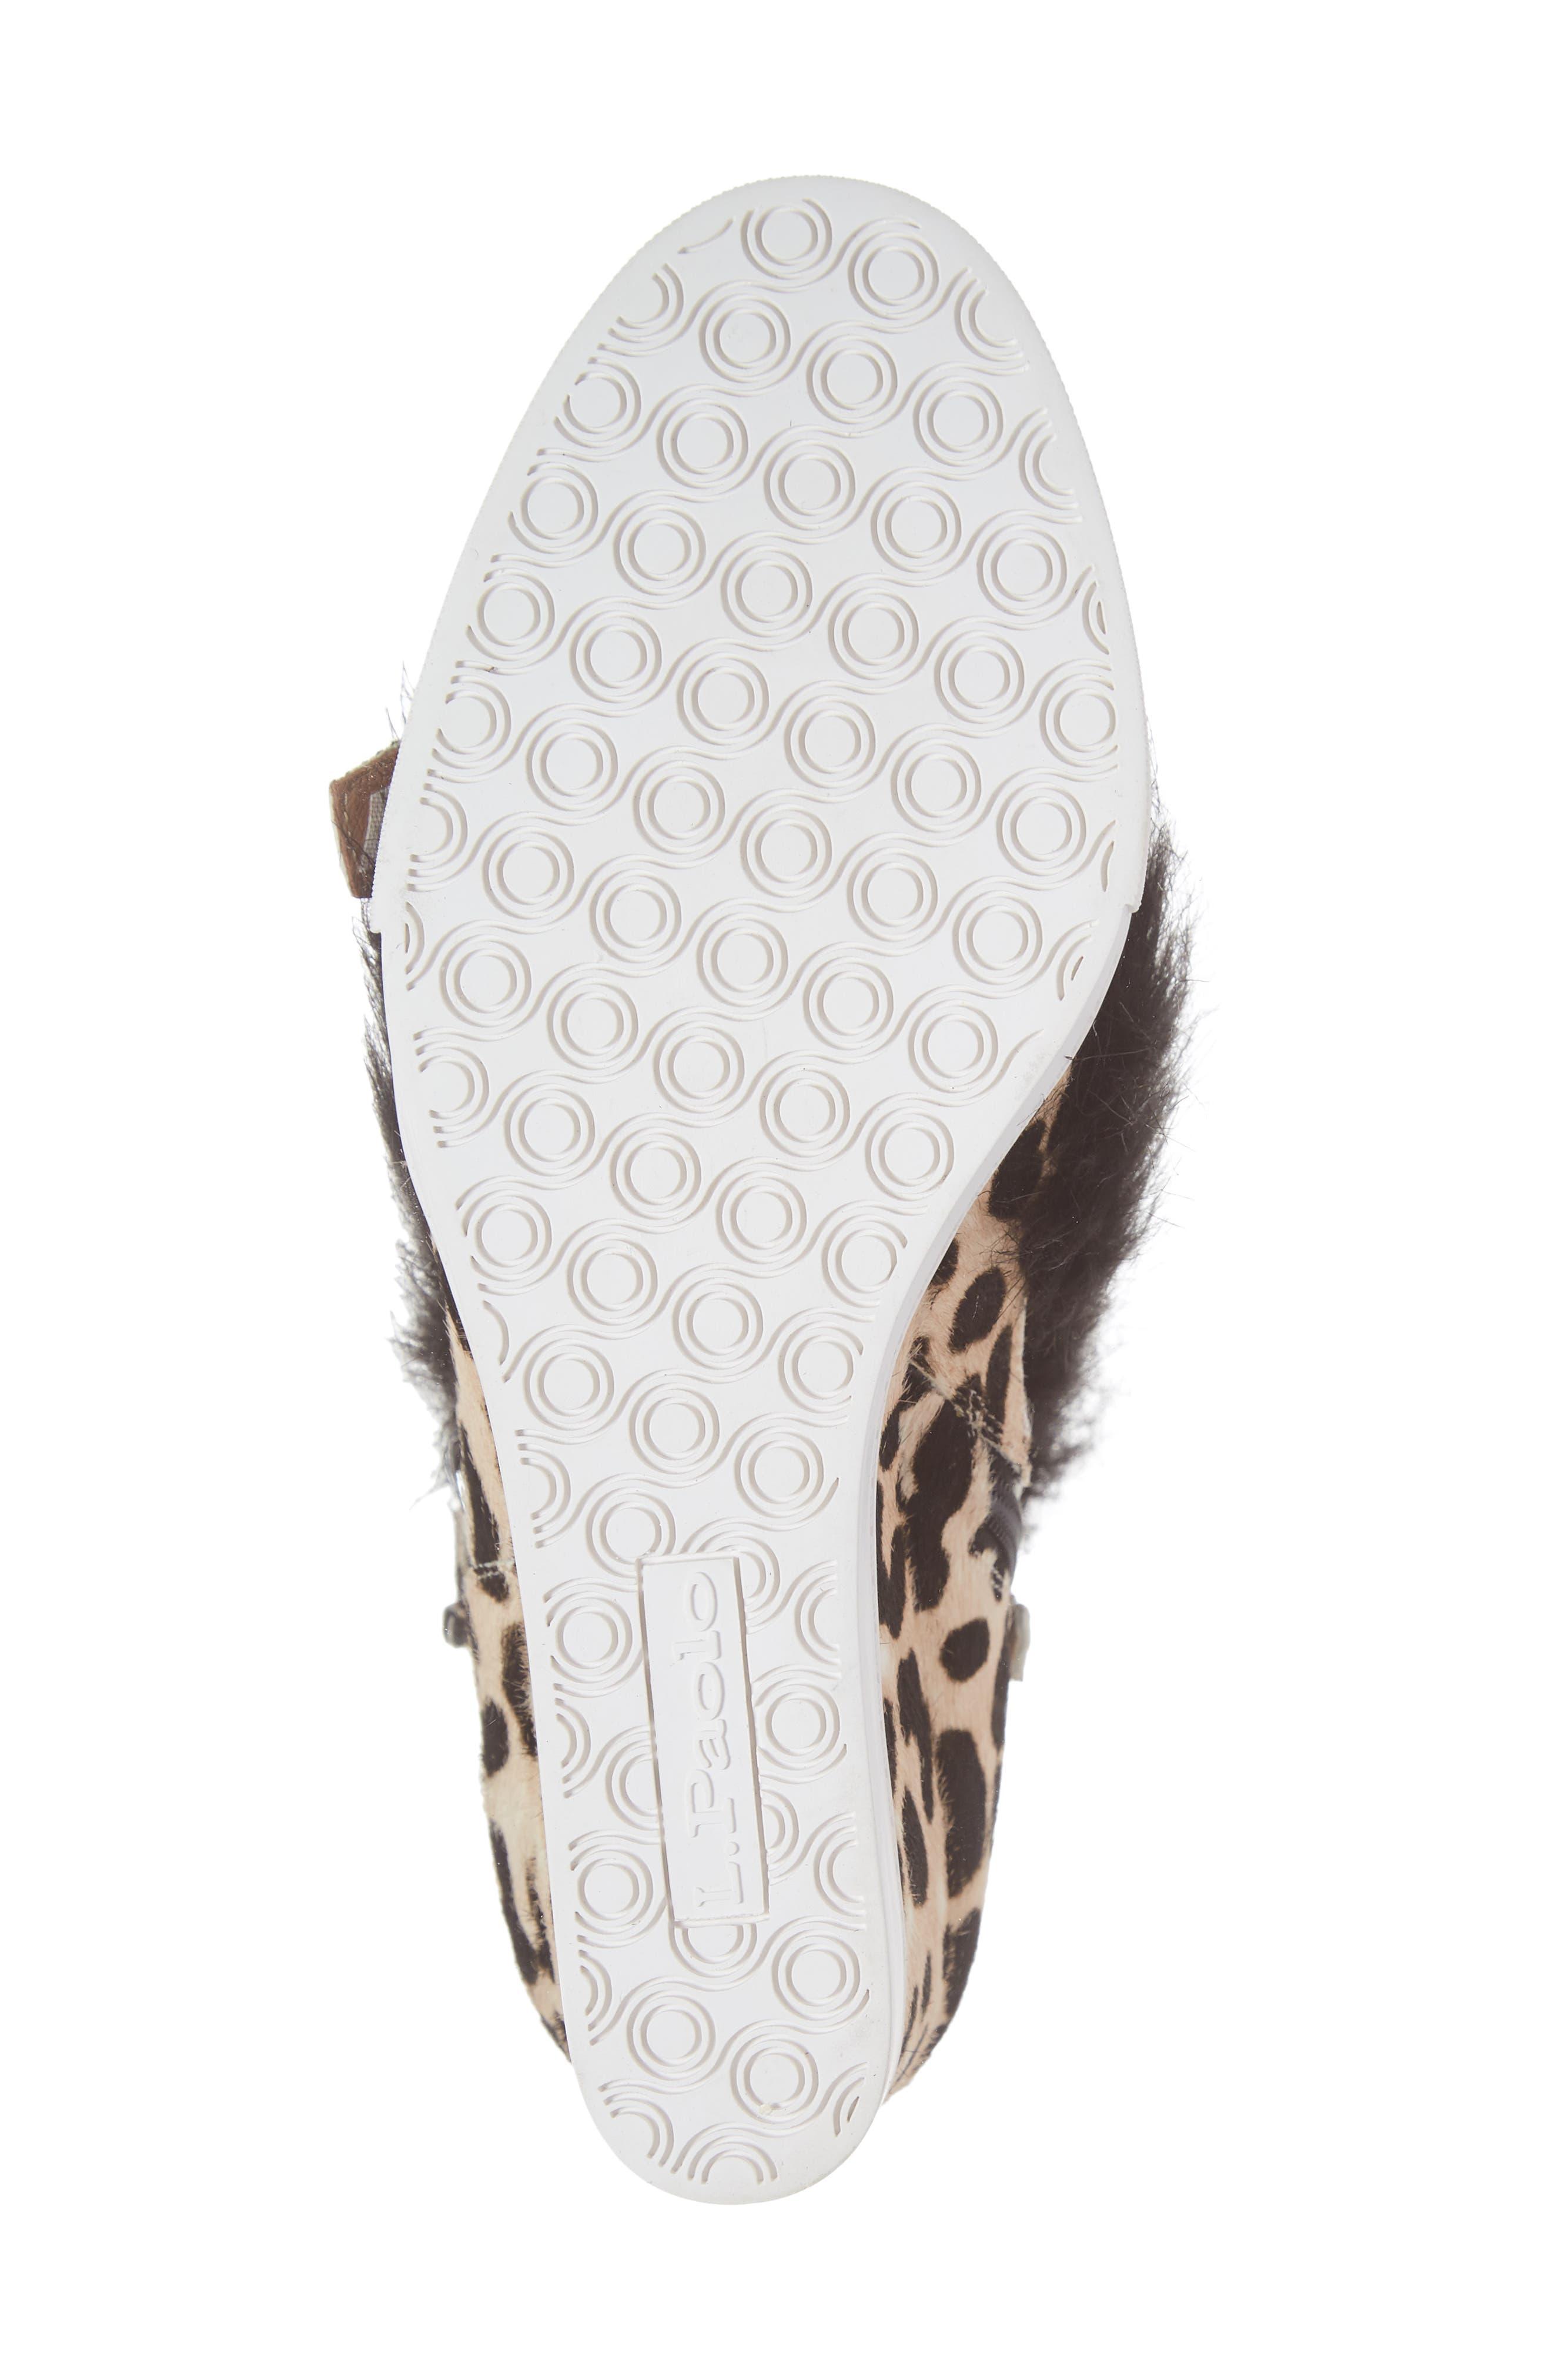 LINEA PAOLO, Fifi 2 Wedge Sneaker, Alternate thumbnail 6, color, WHITE/ BLACK LEOPARD HAIRCALF